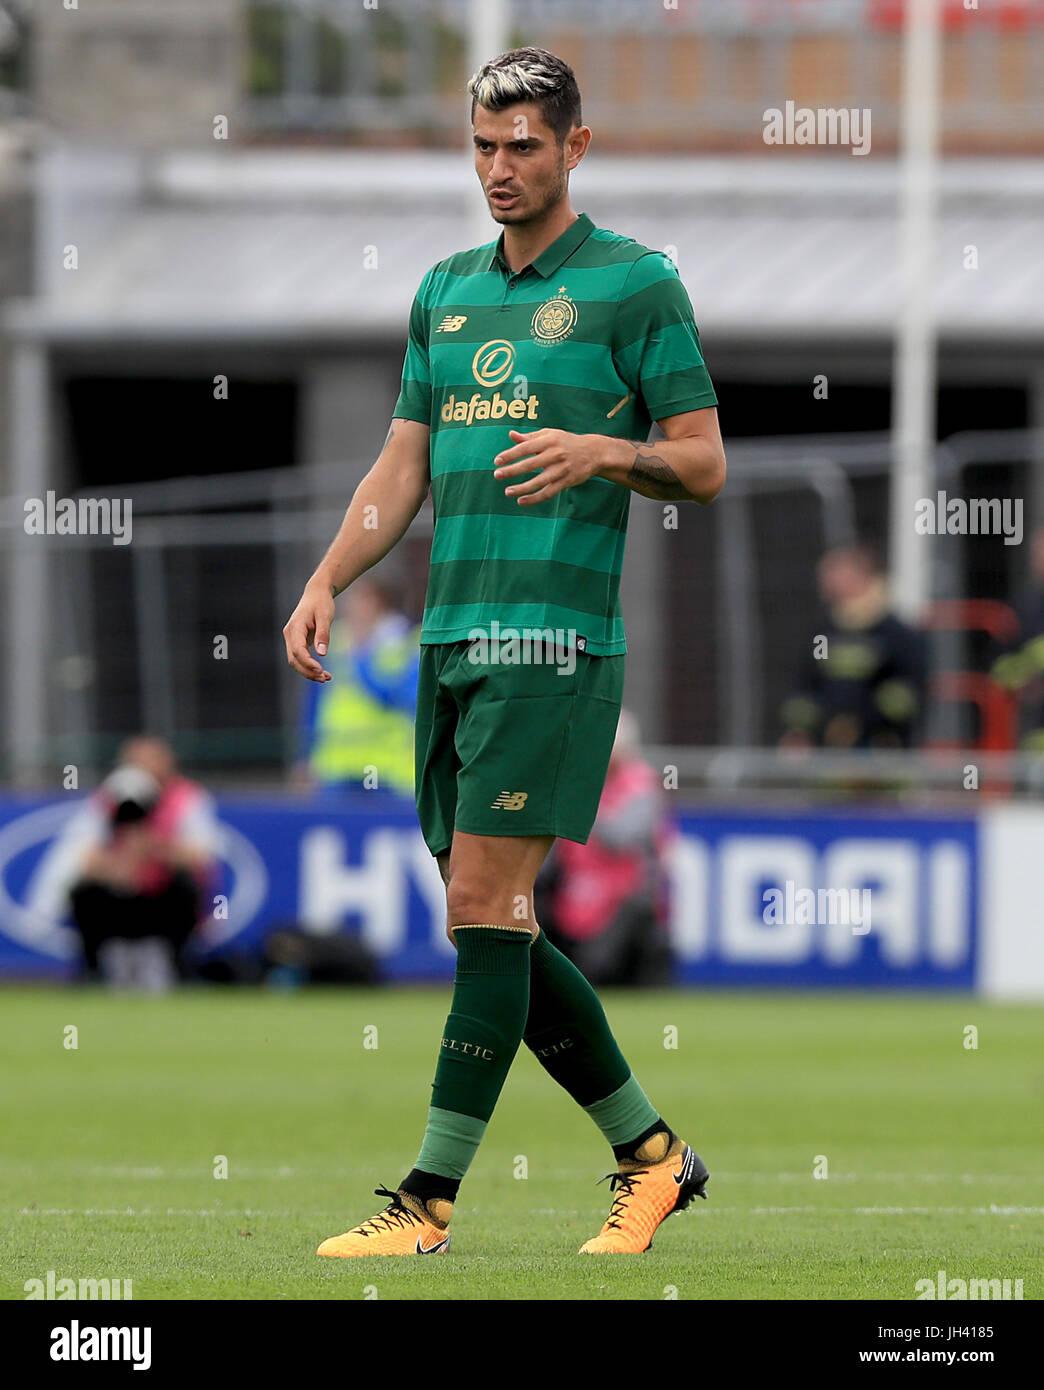 Celtic's Nir Bitton during the pre-season friendly at the Tallaght Stadium, Dublin. - Stock Image